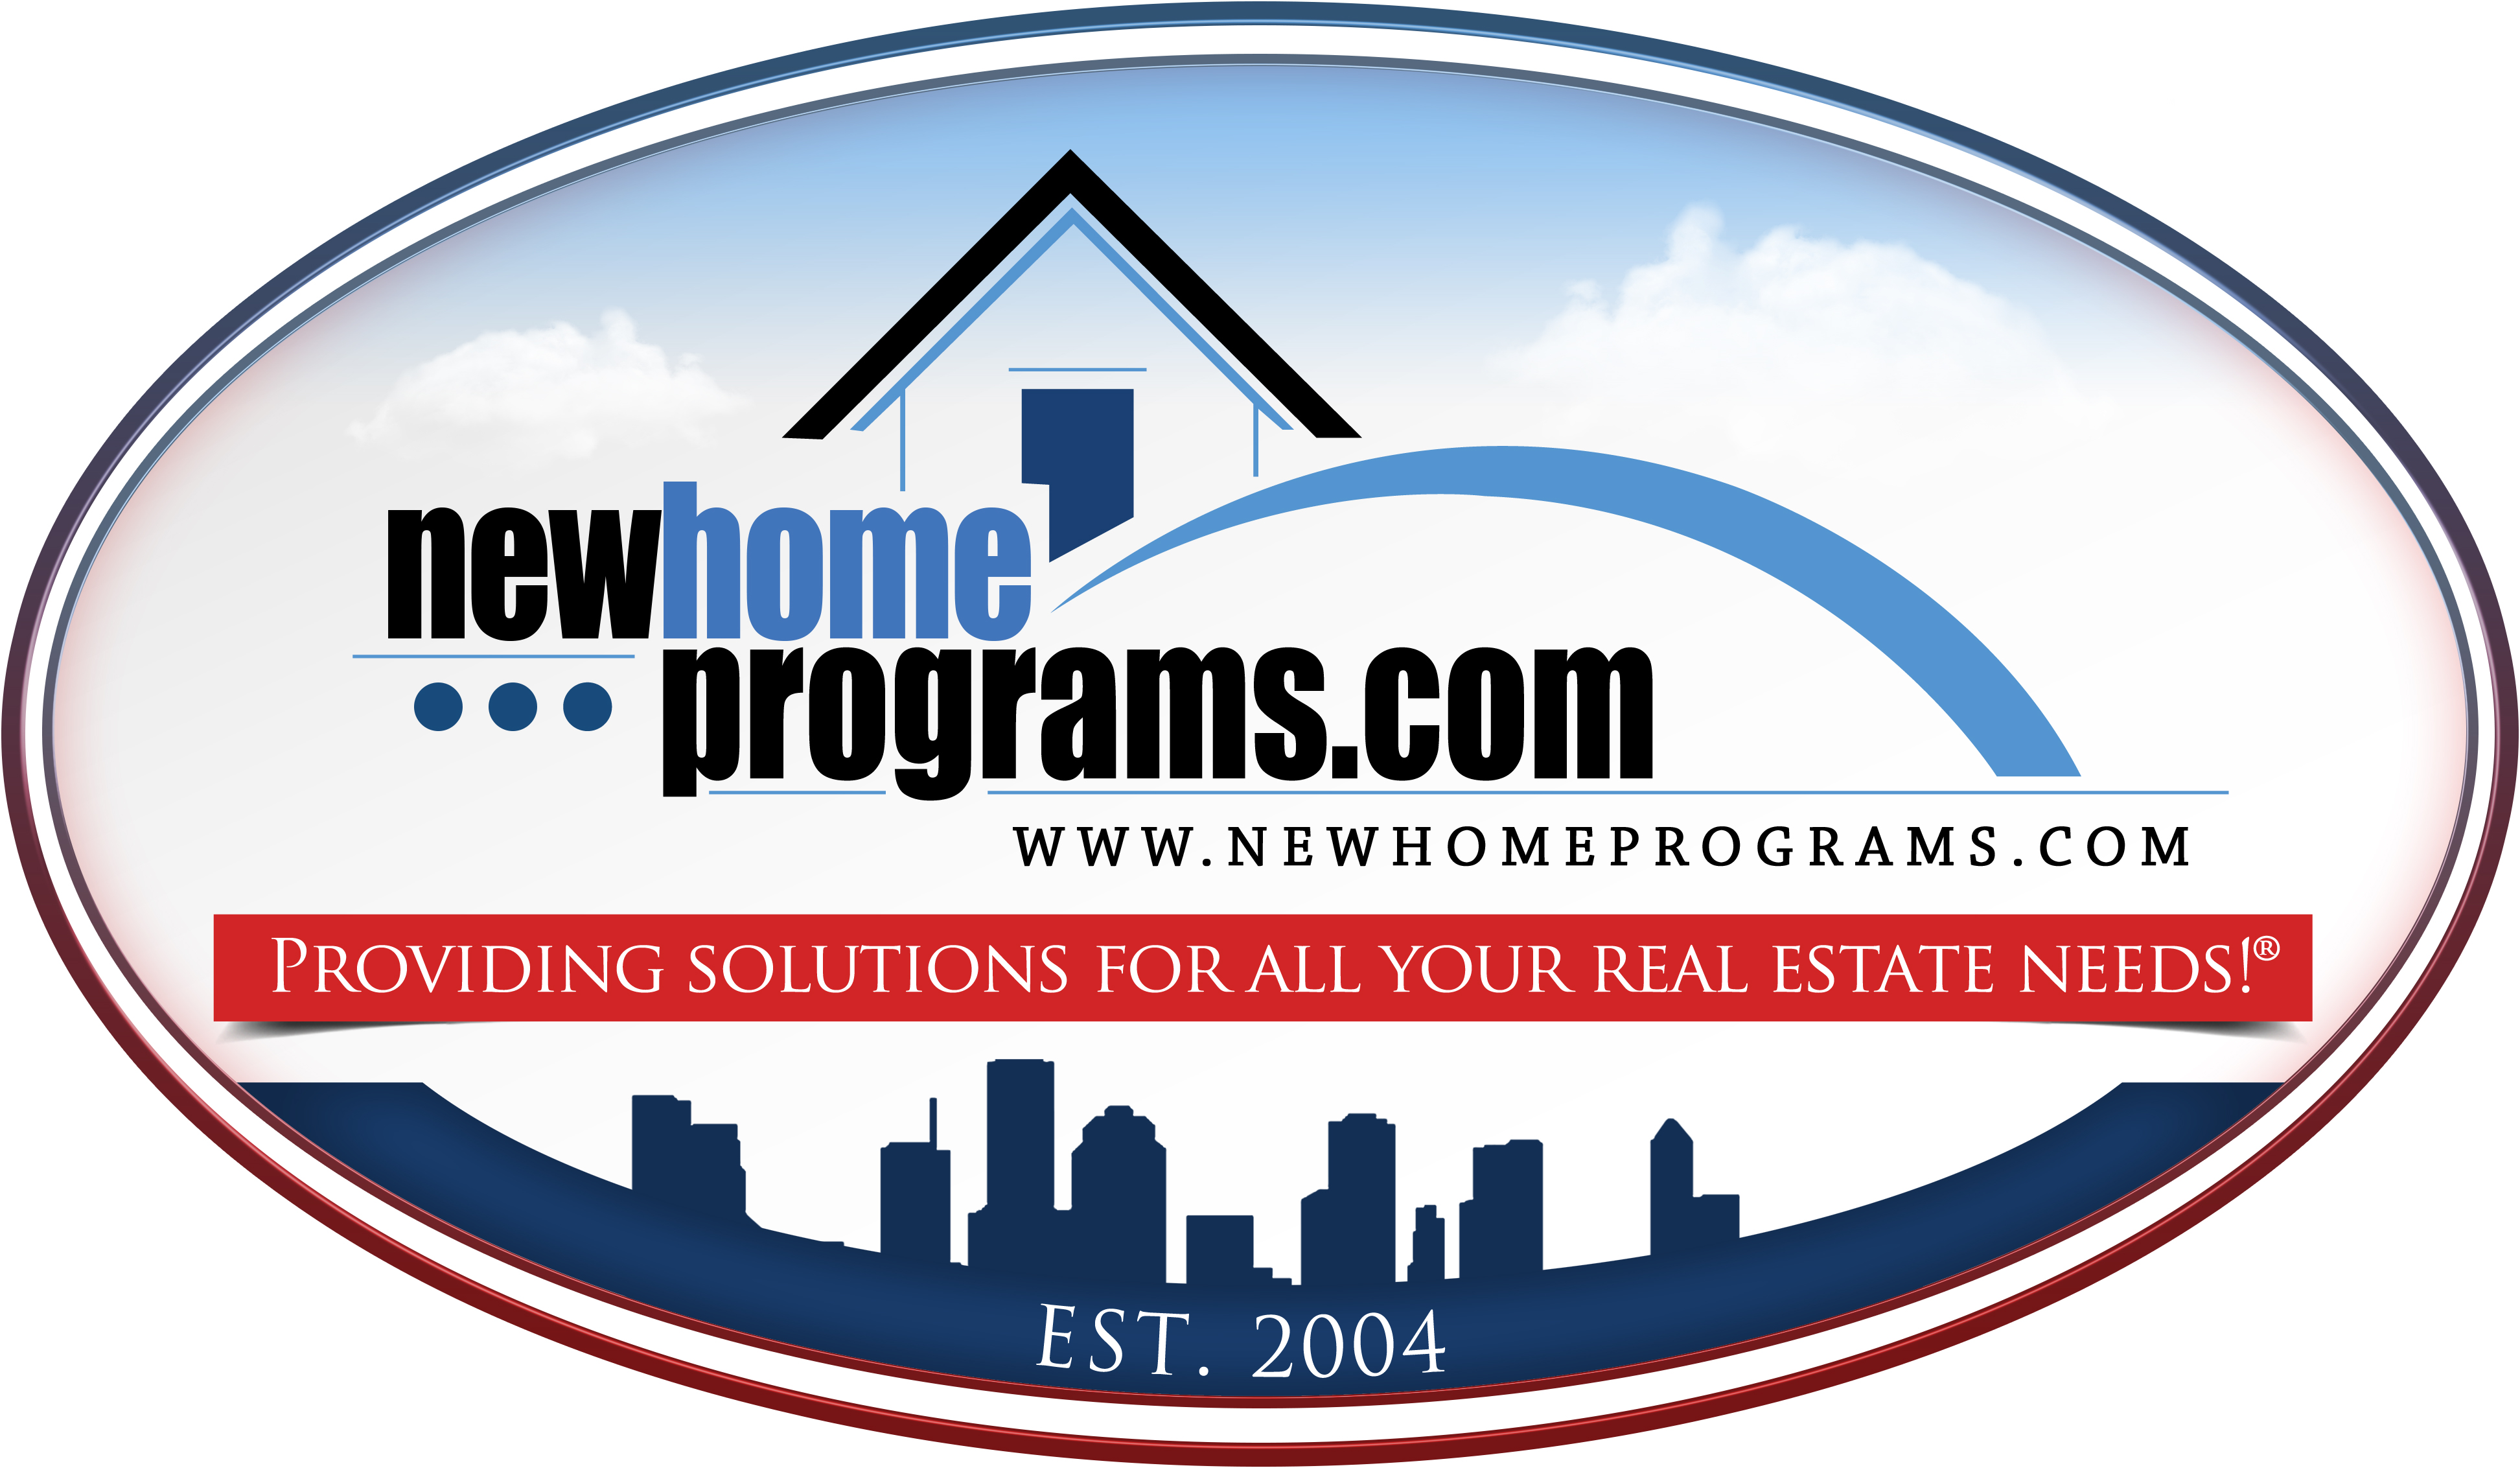 Newhomeprograms.com | Dallas-Fort Worth logo